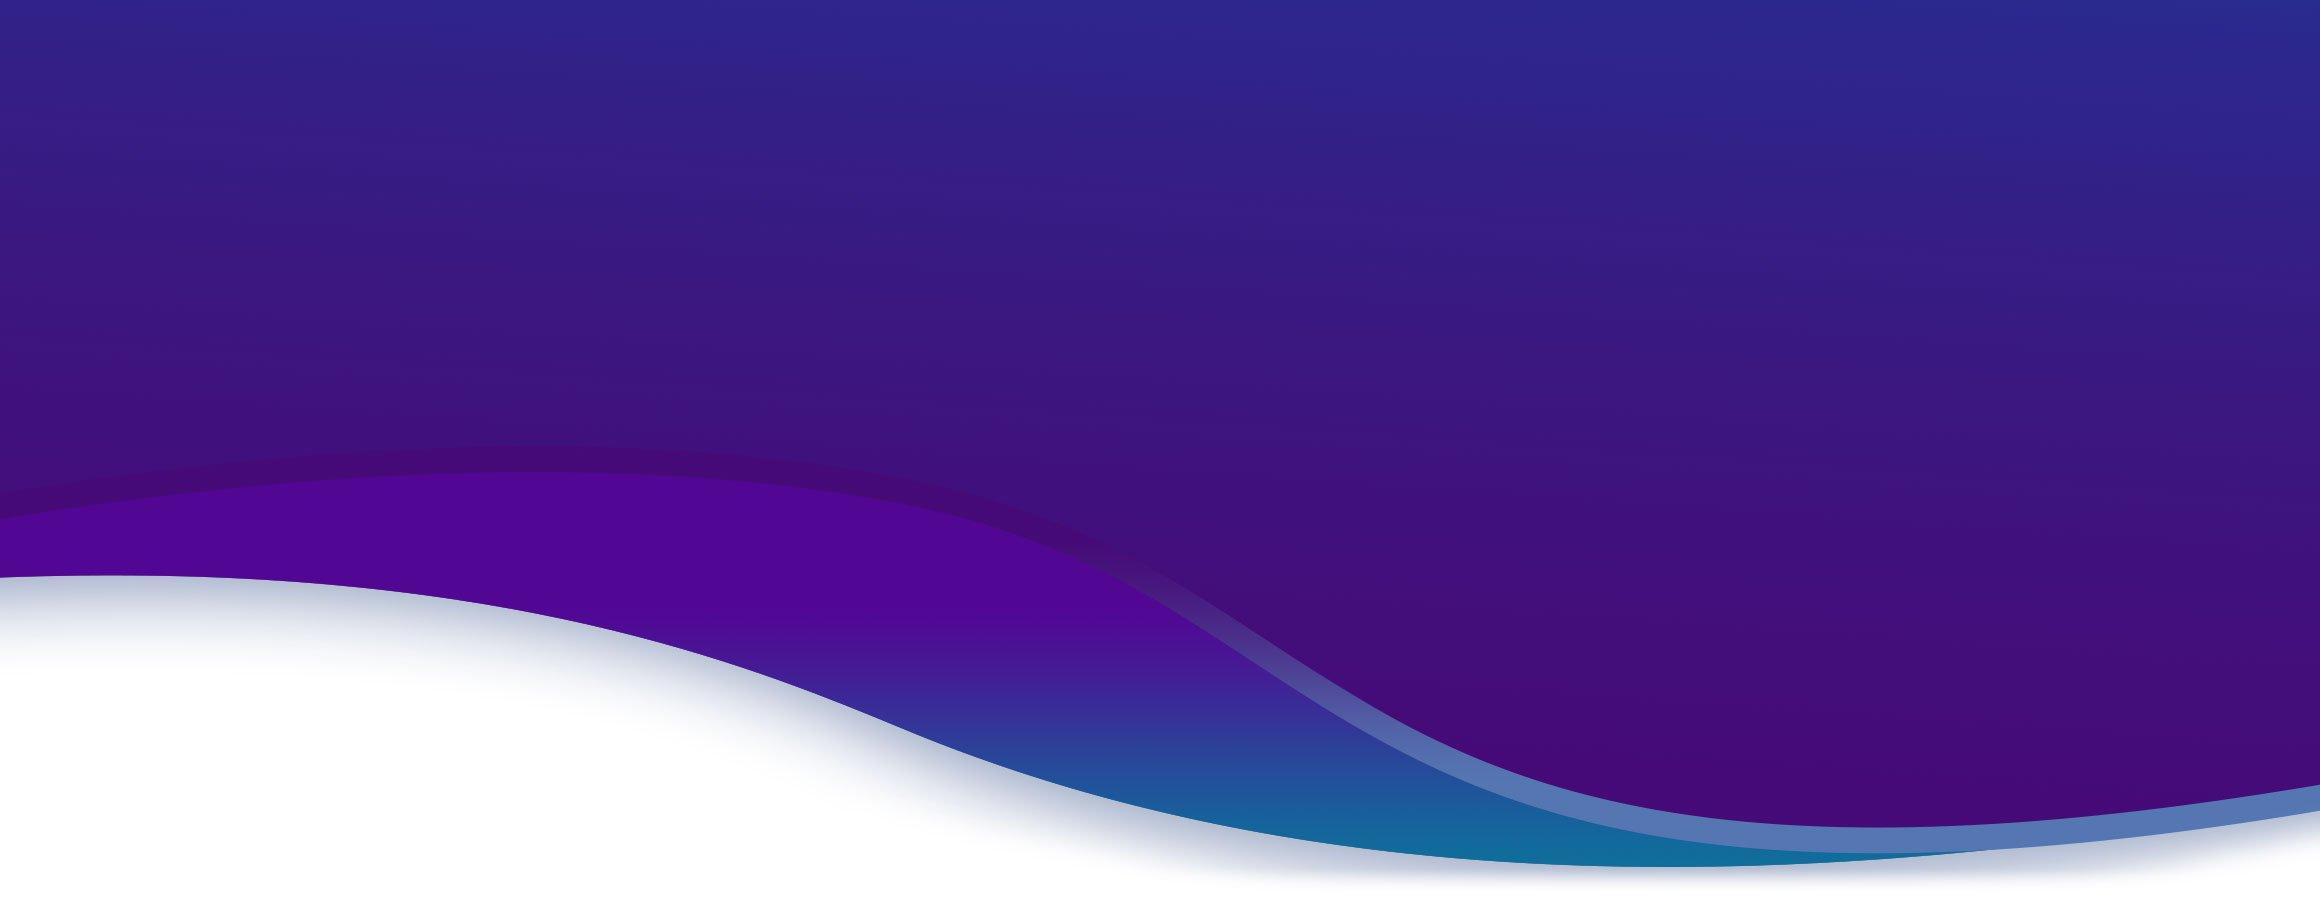 purple-hero-background